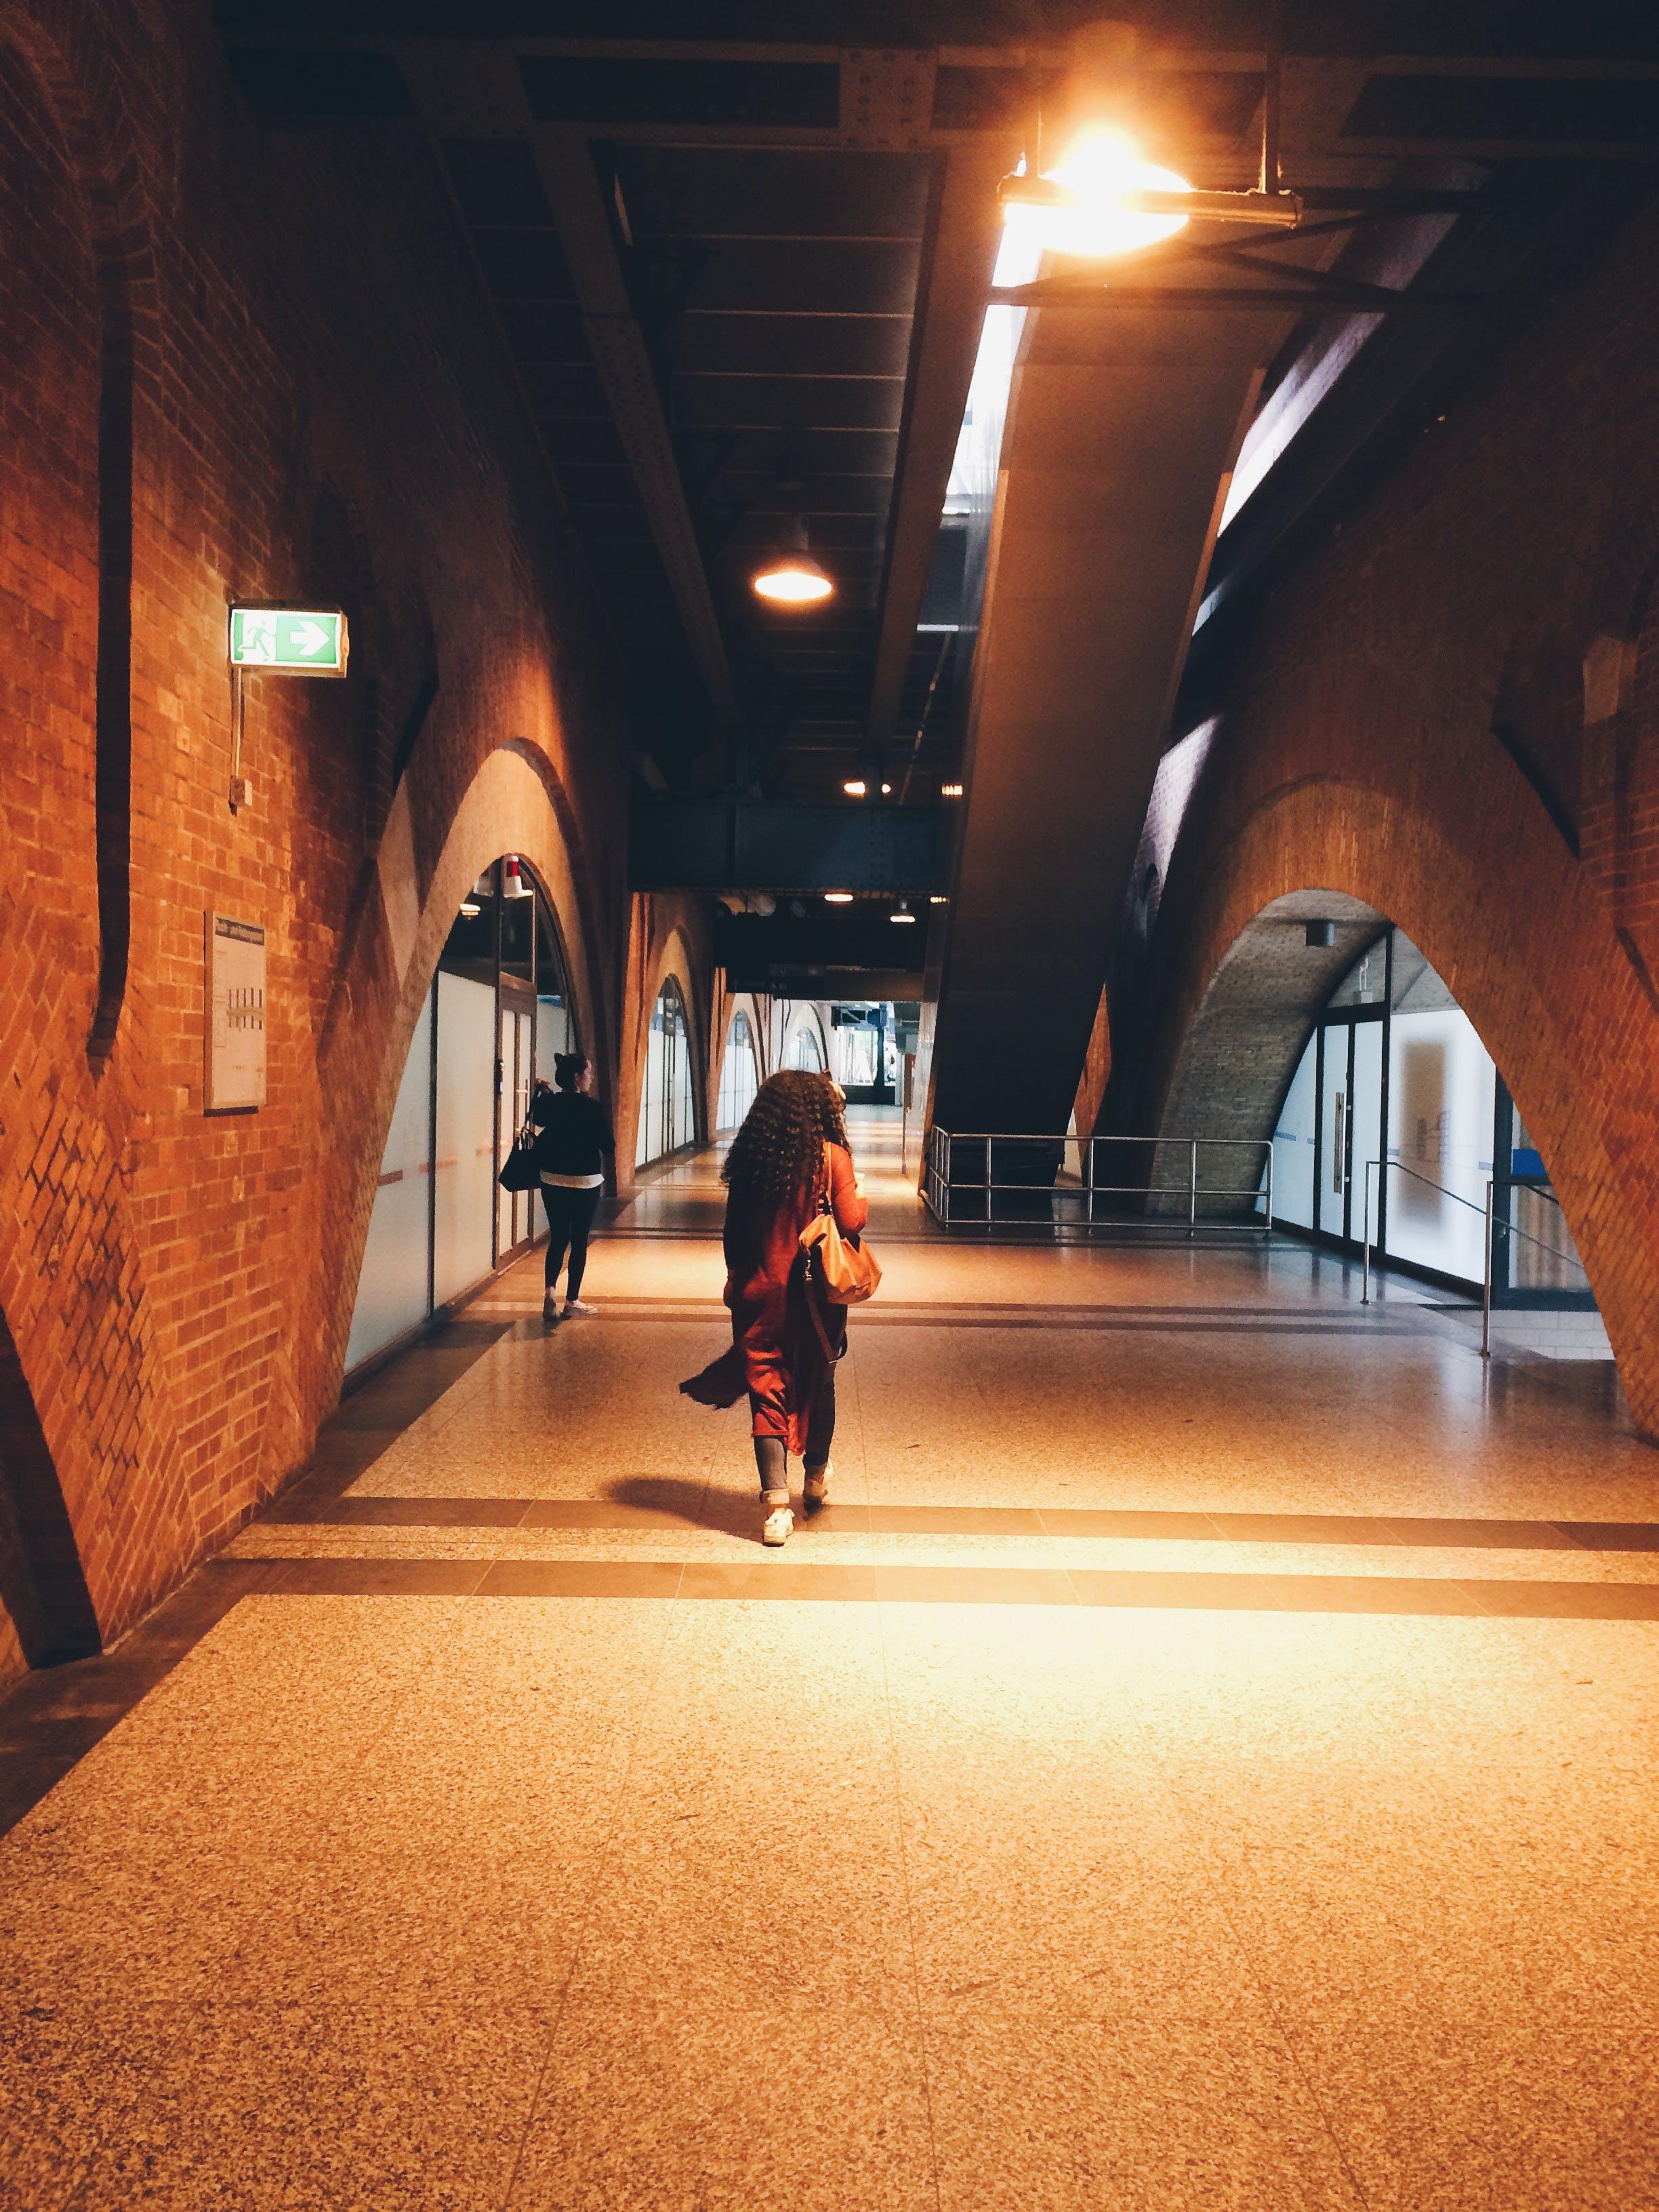 Free stock photo of light, woman, street, walking